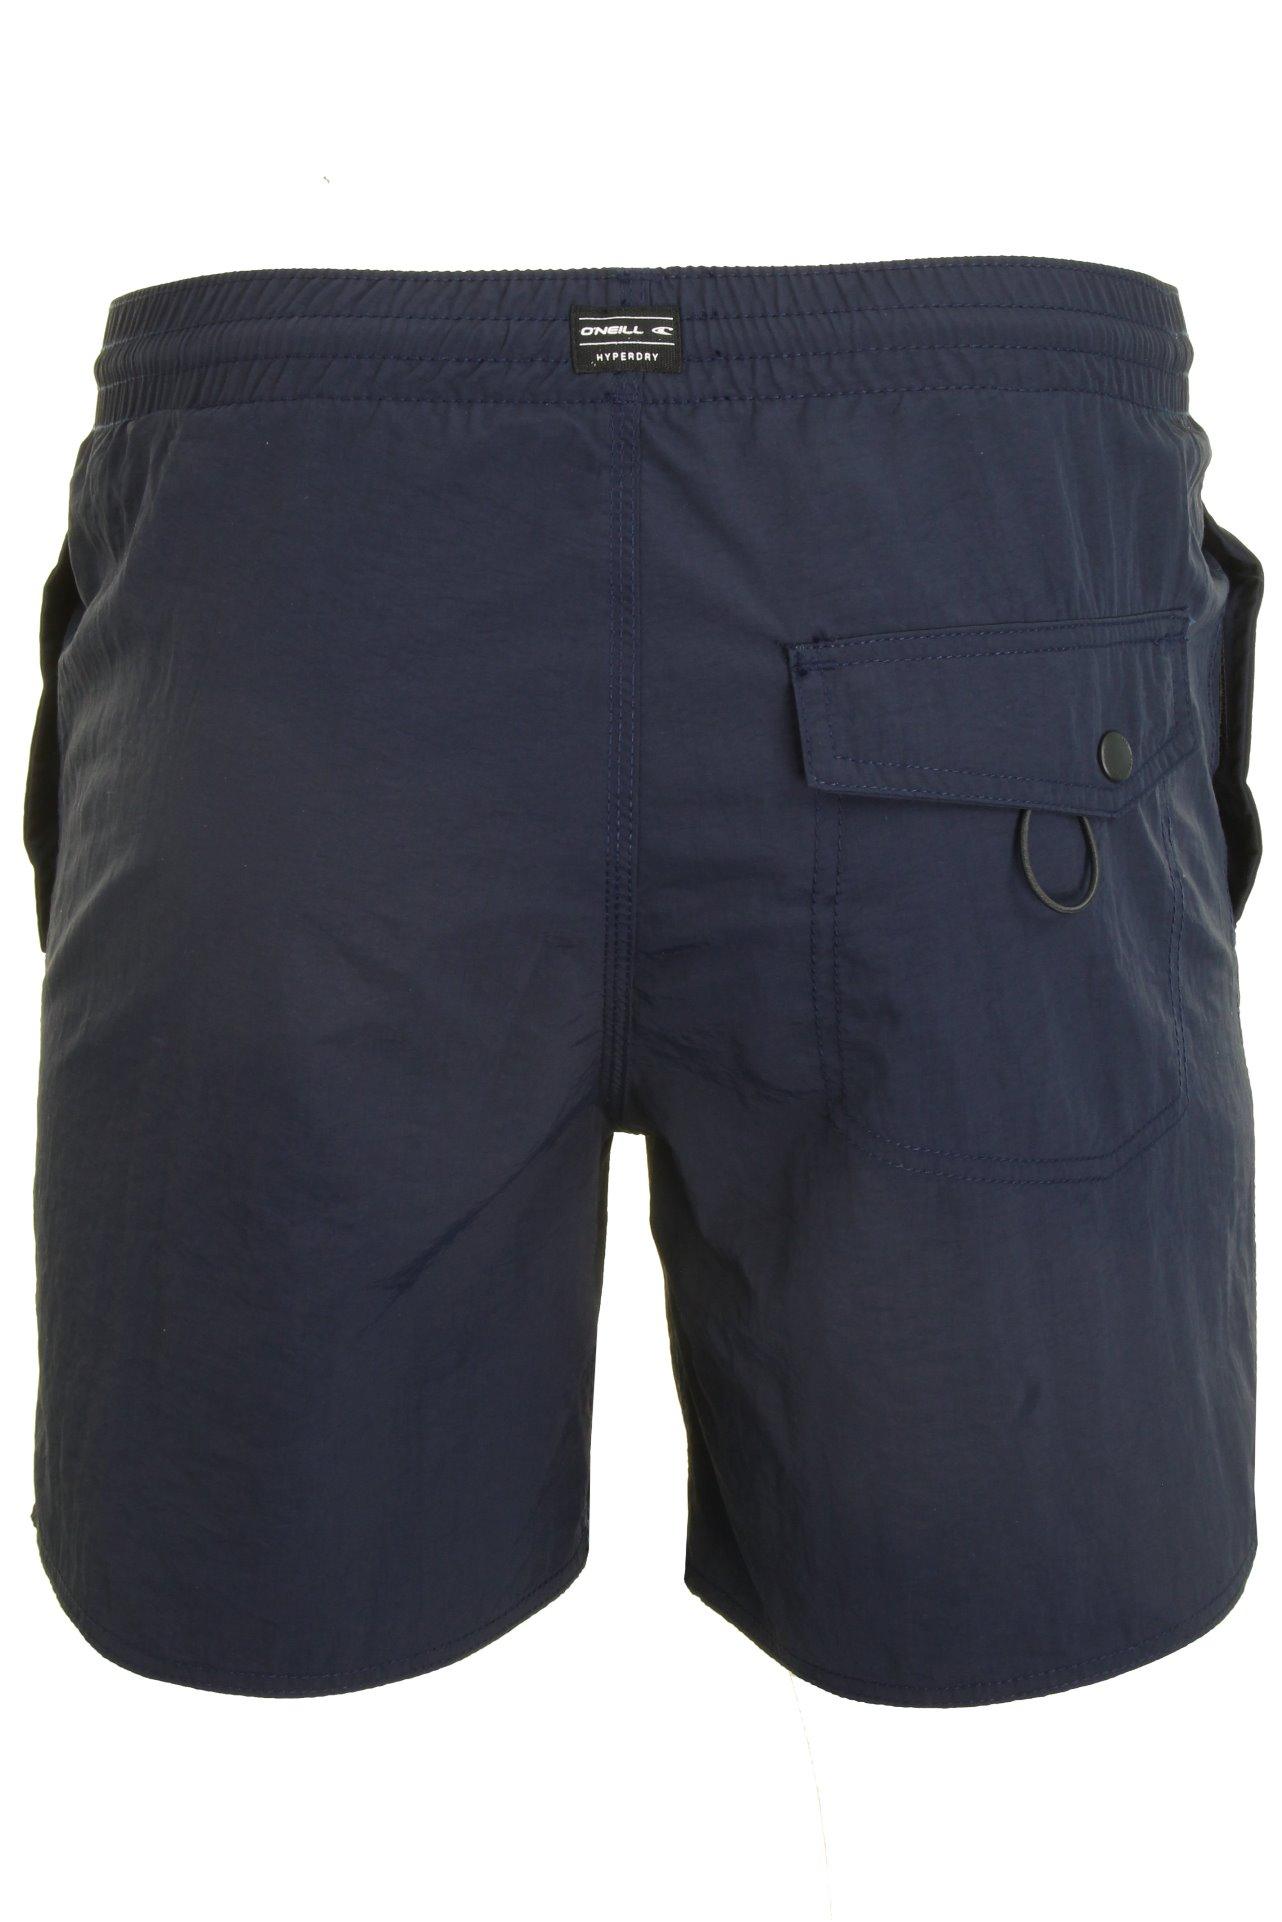 O-039-Neill-Mens-039-Vert-039-Swim-Board-Shorts thumbnail 14